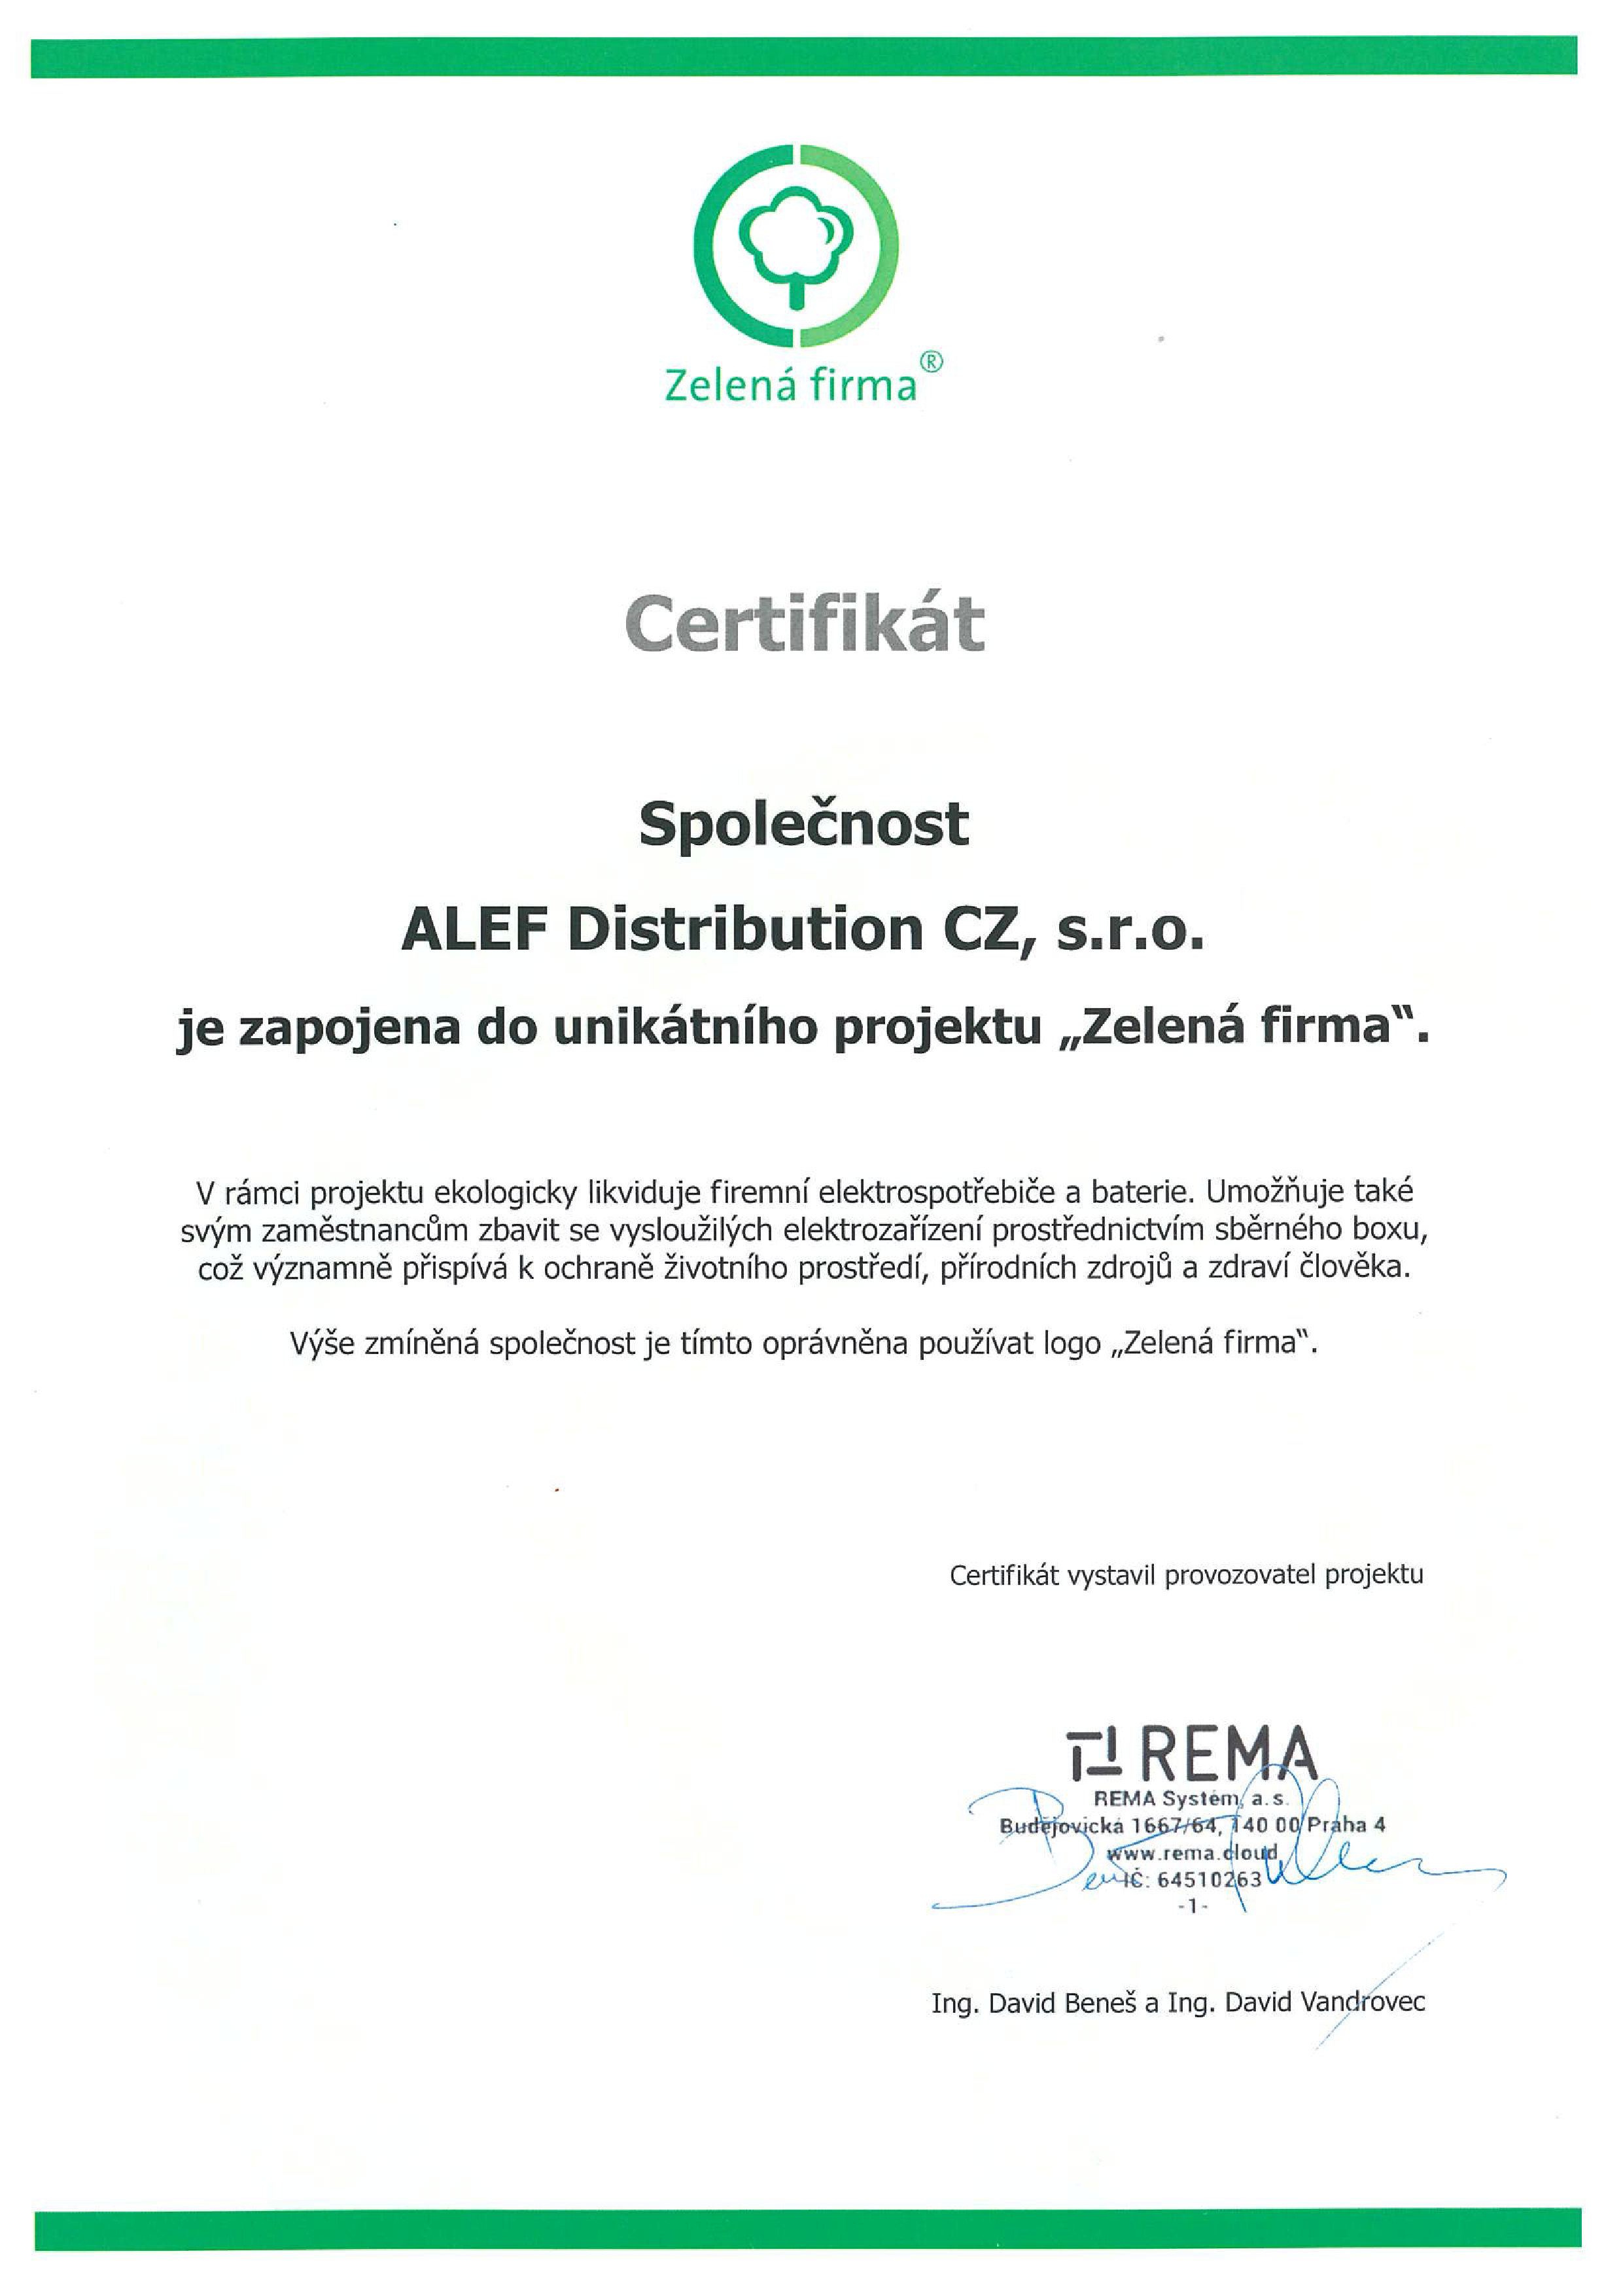 ALEF Zelená Firma